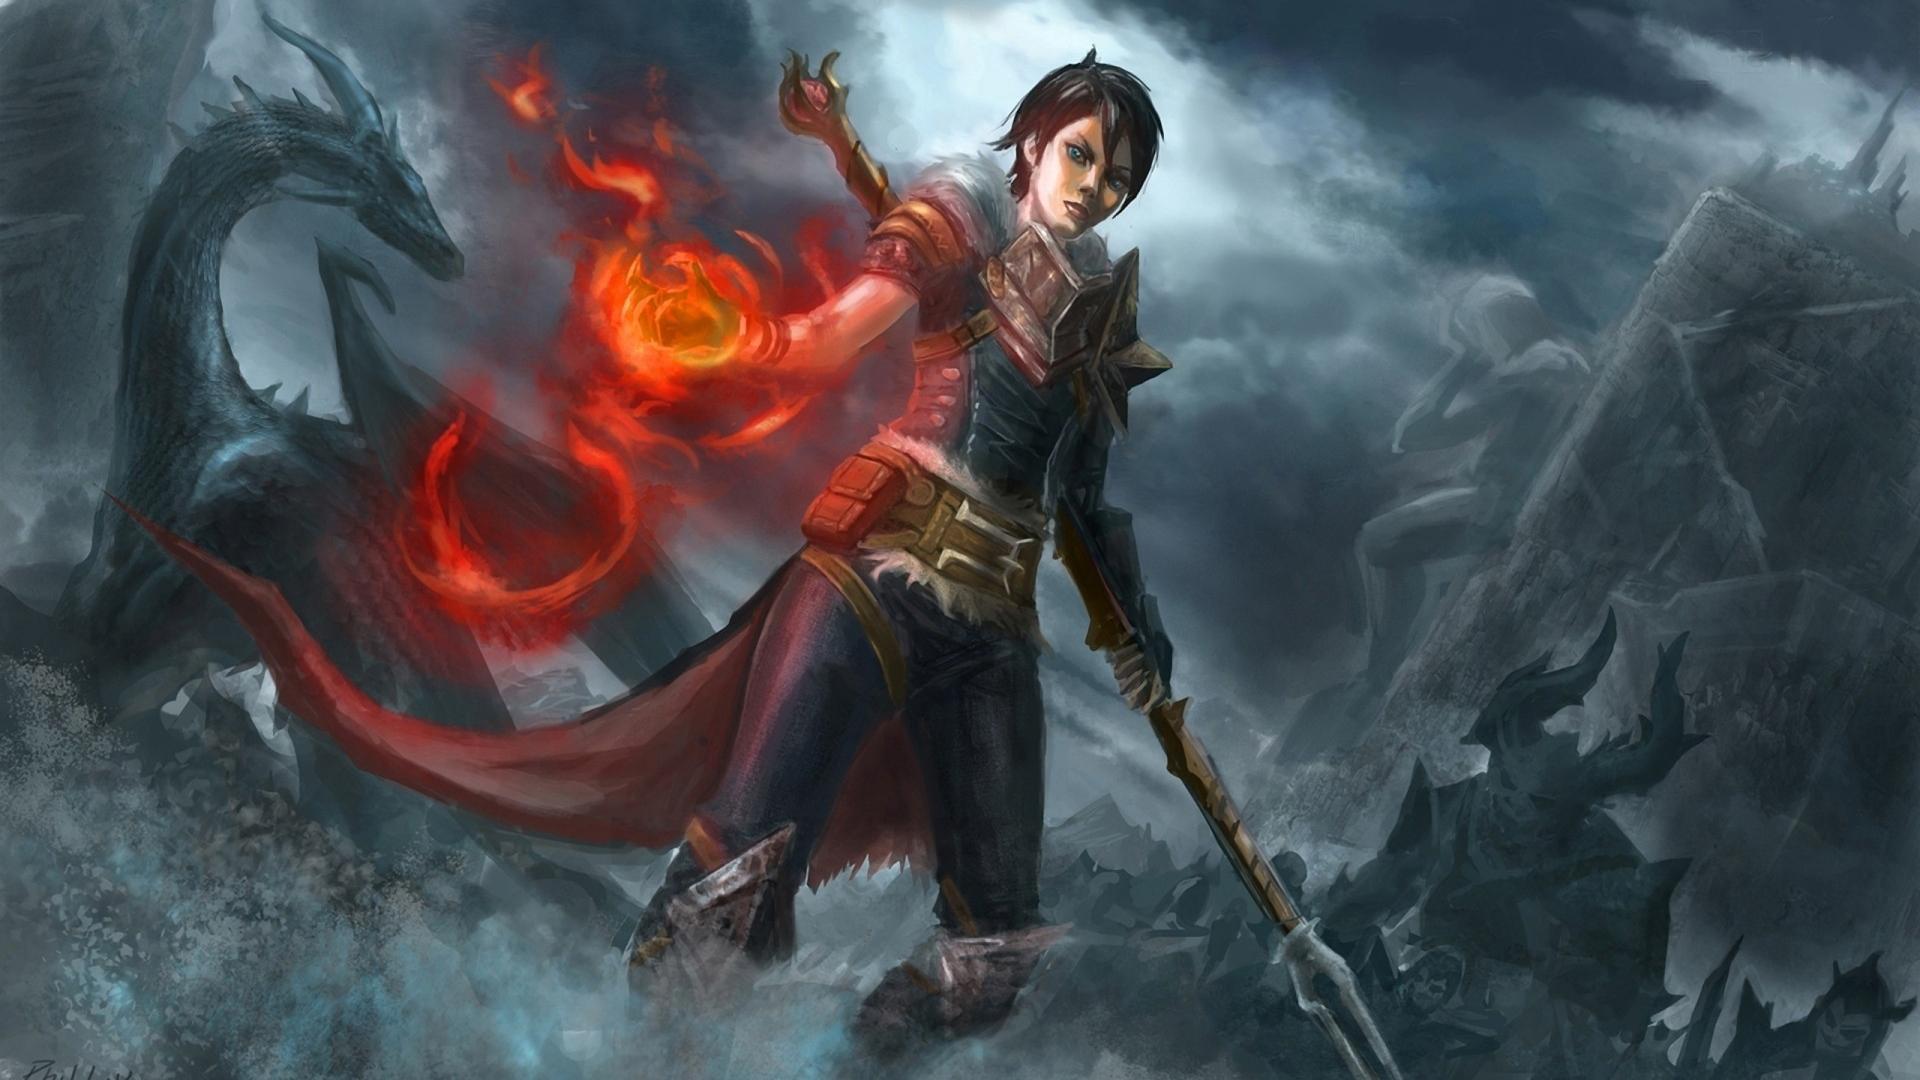 Dragon Age: Origins HD Wallpaper